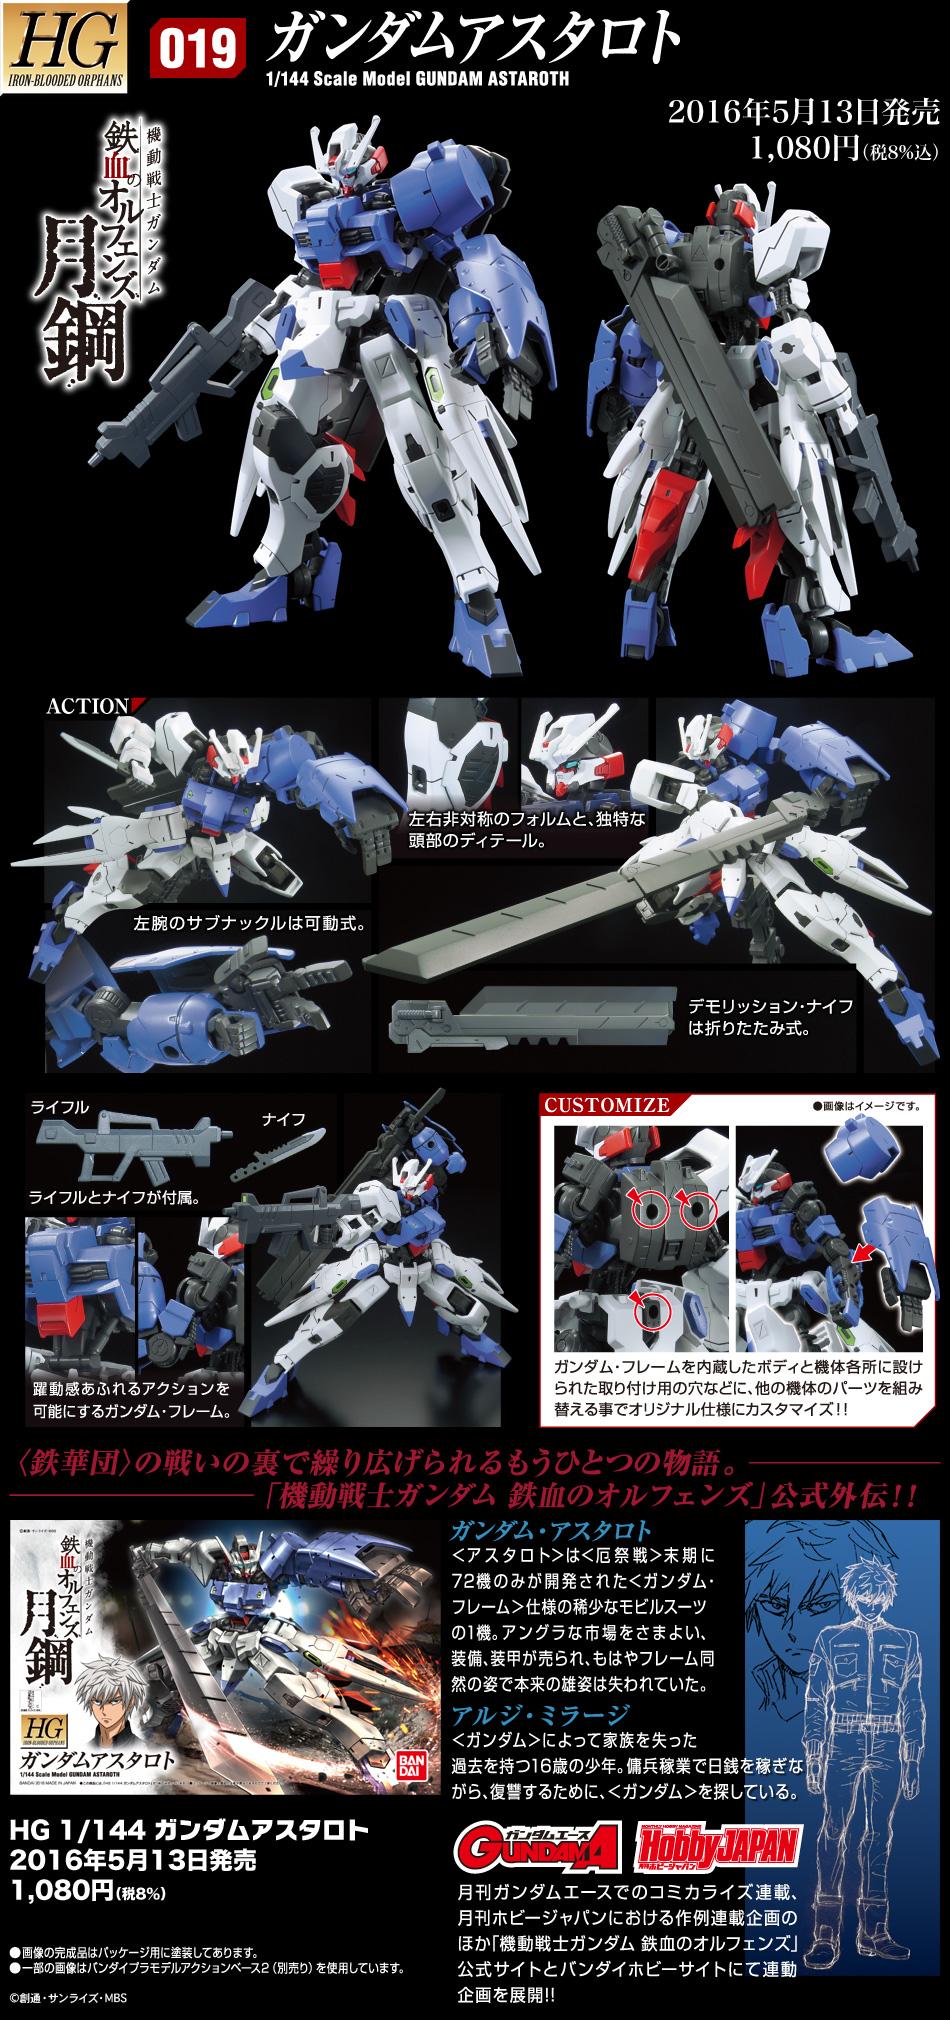 HG 1/144 ASW-G-29 ガンダムアスタロト [Gundam Astaroth] 公式商品説明(画像)